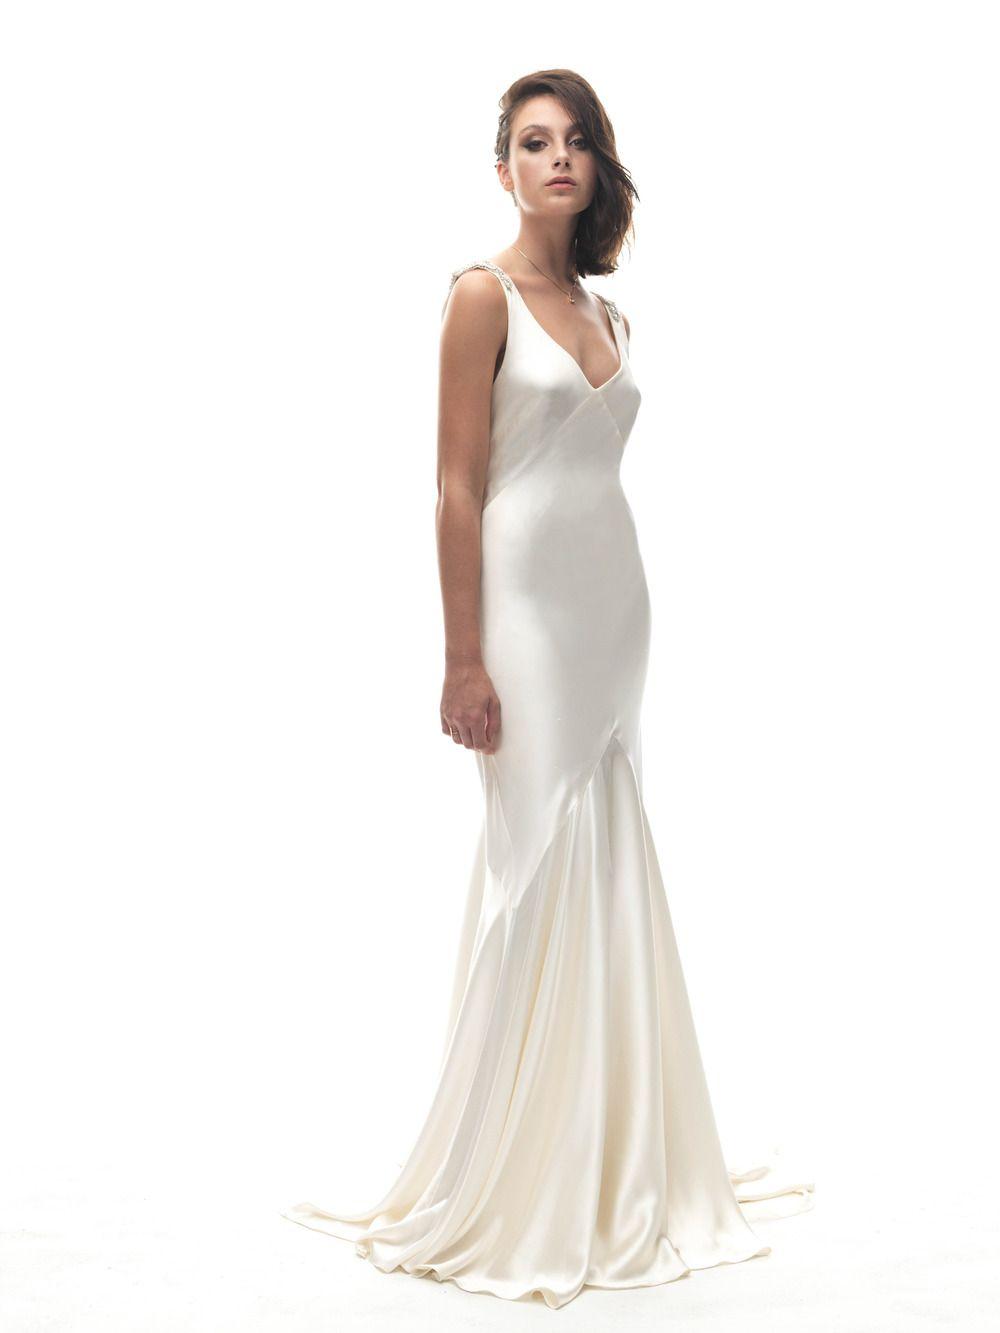 Wedding dressing gowns  Daxa frontg  Dressing Up  Pinterest  Wedding